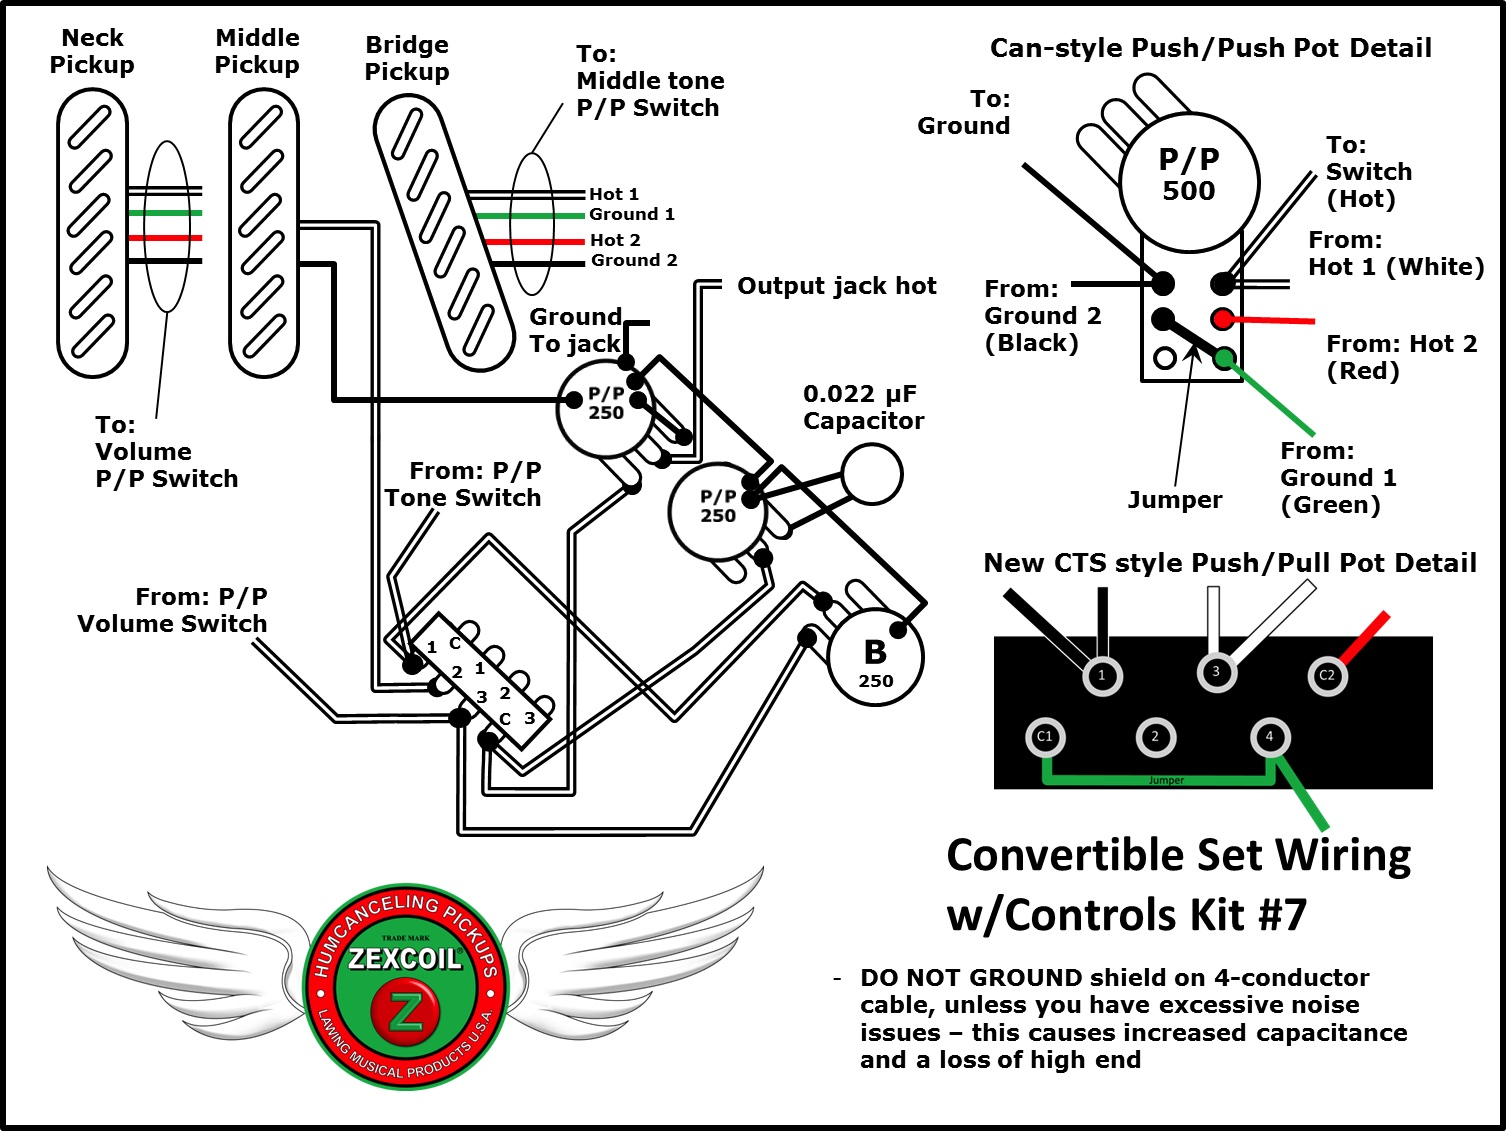 Controls Kit #7